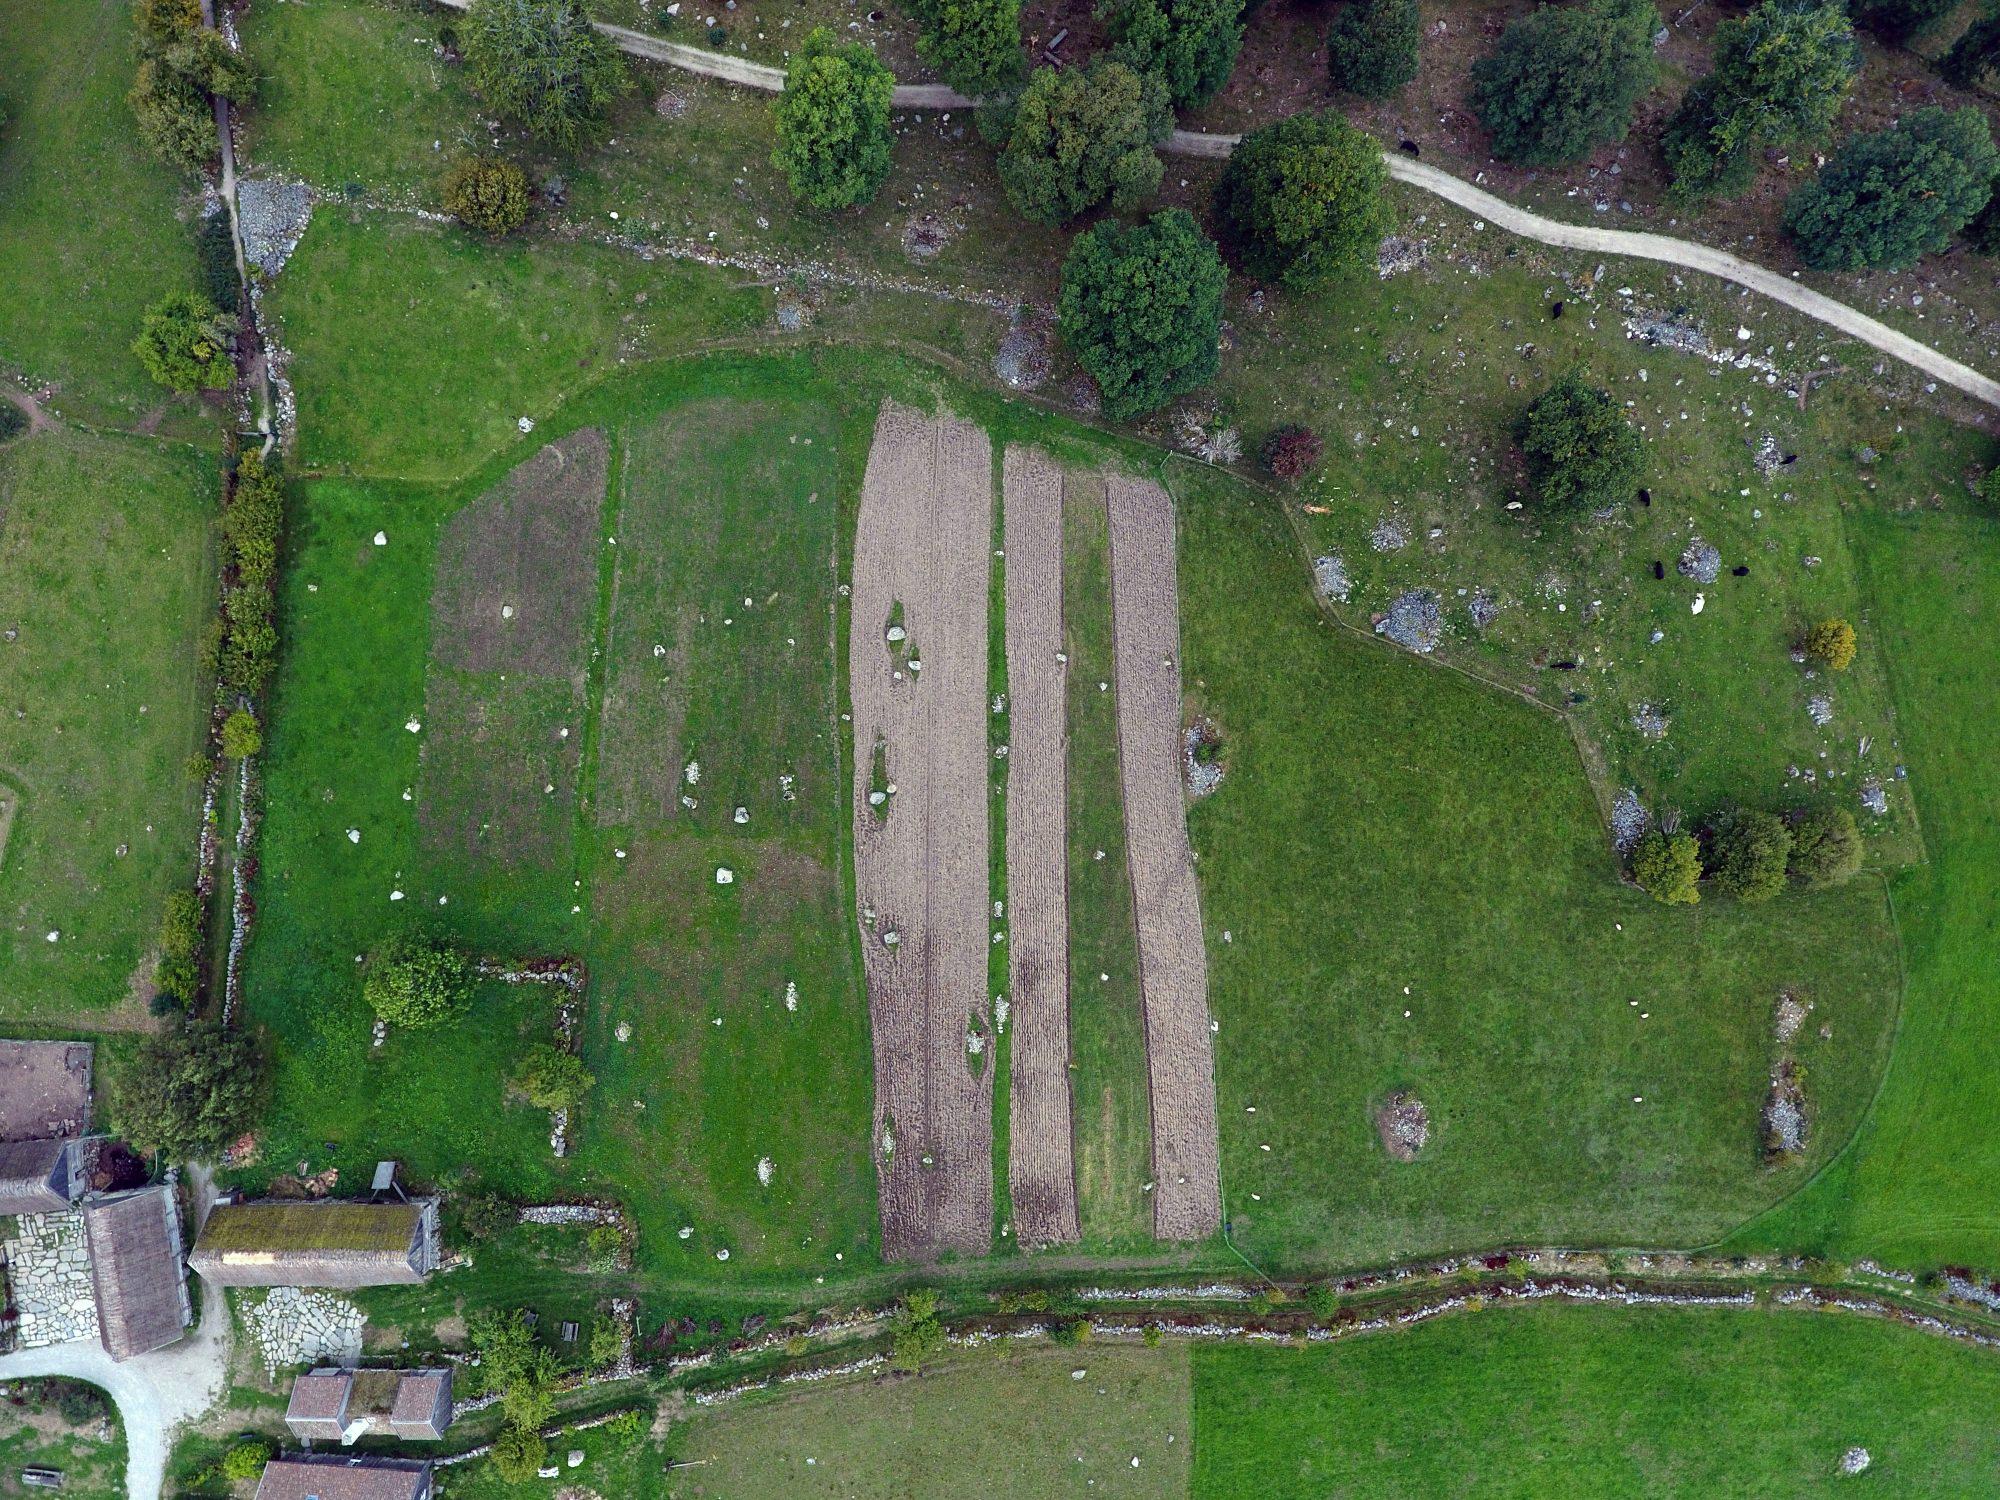 Jönsas Field, drone photo